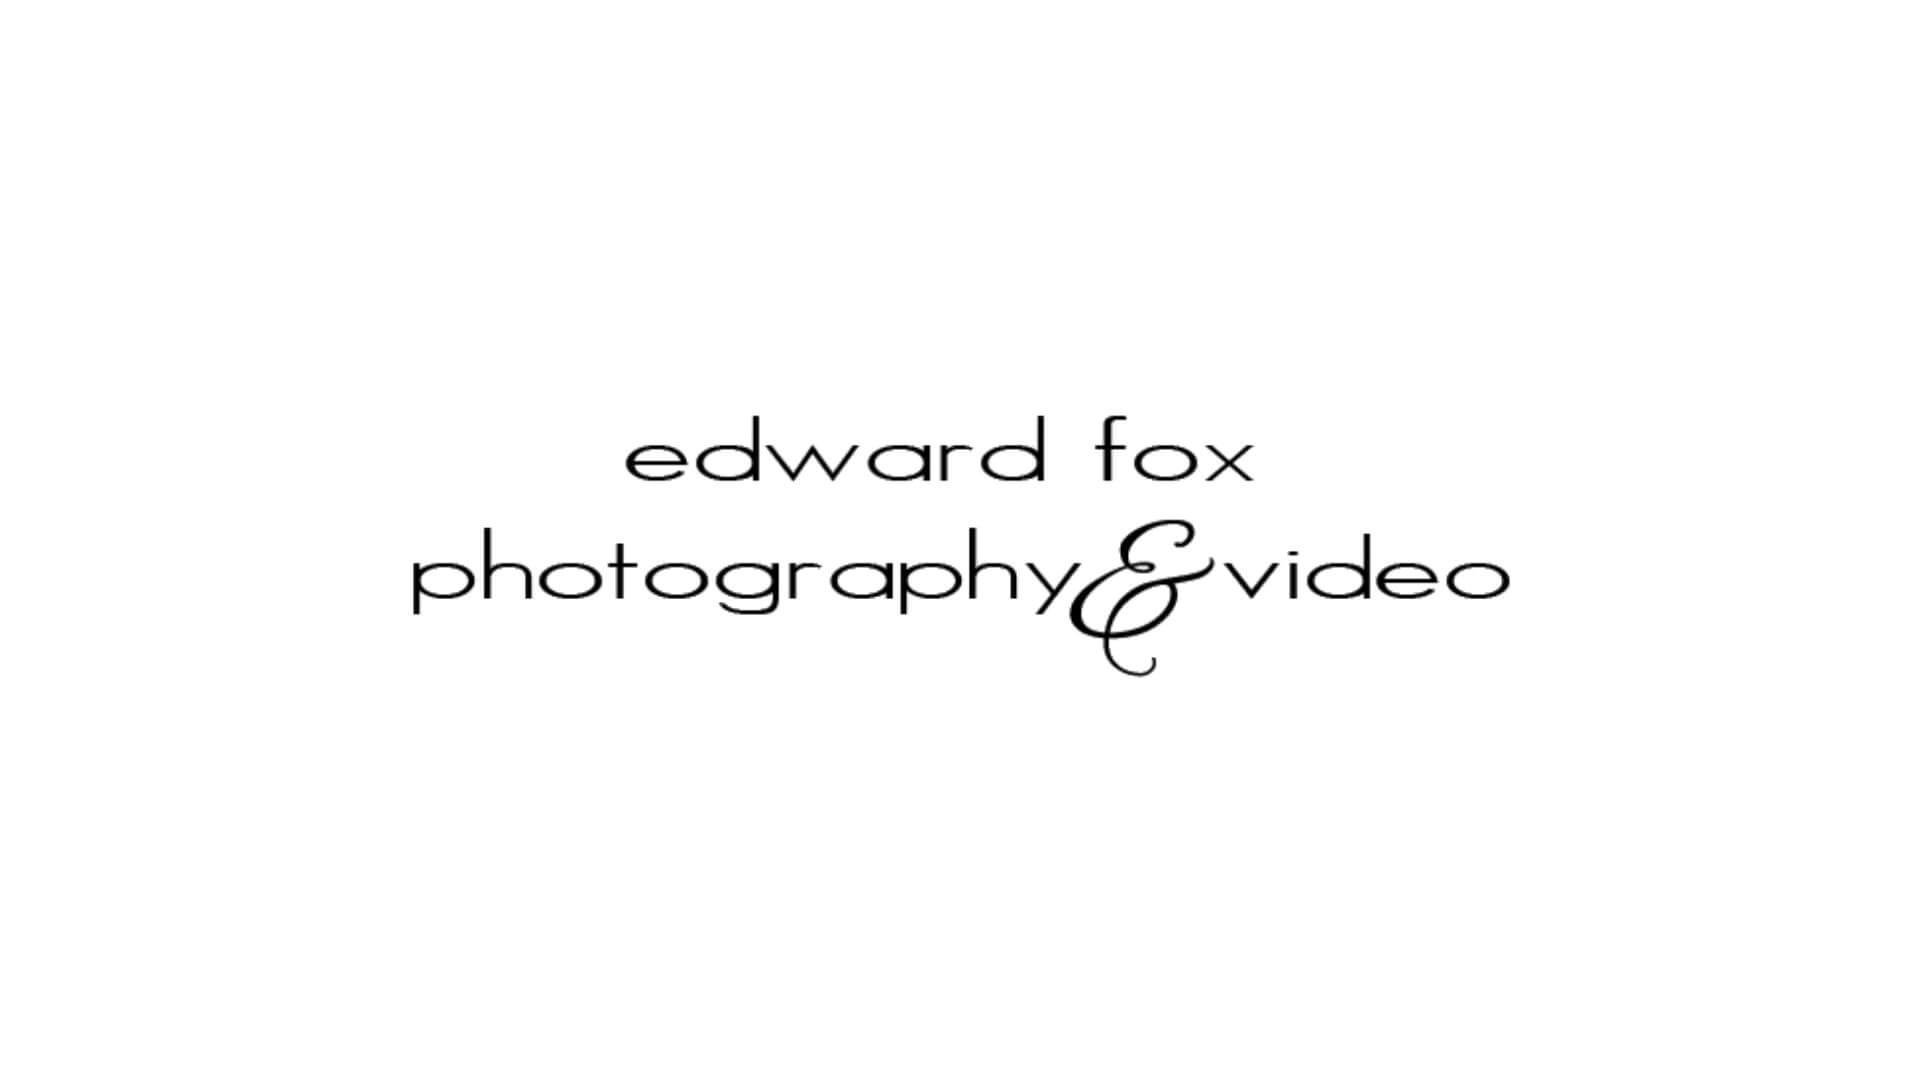 Edward Fox Event Photography  Video logo